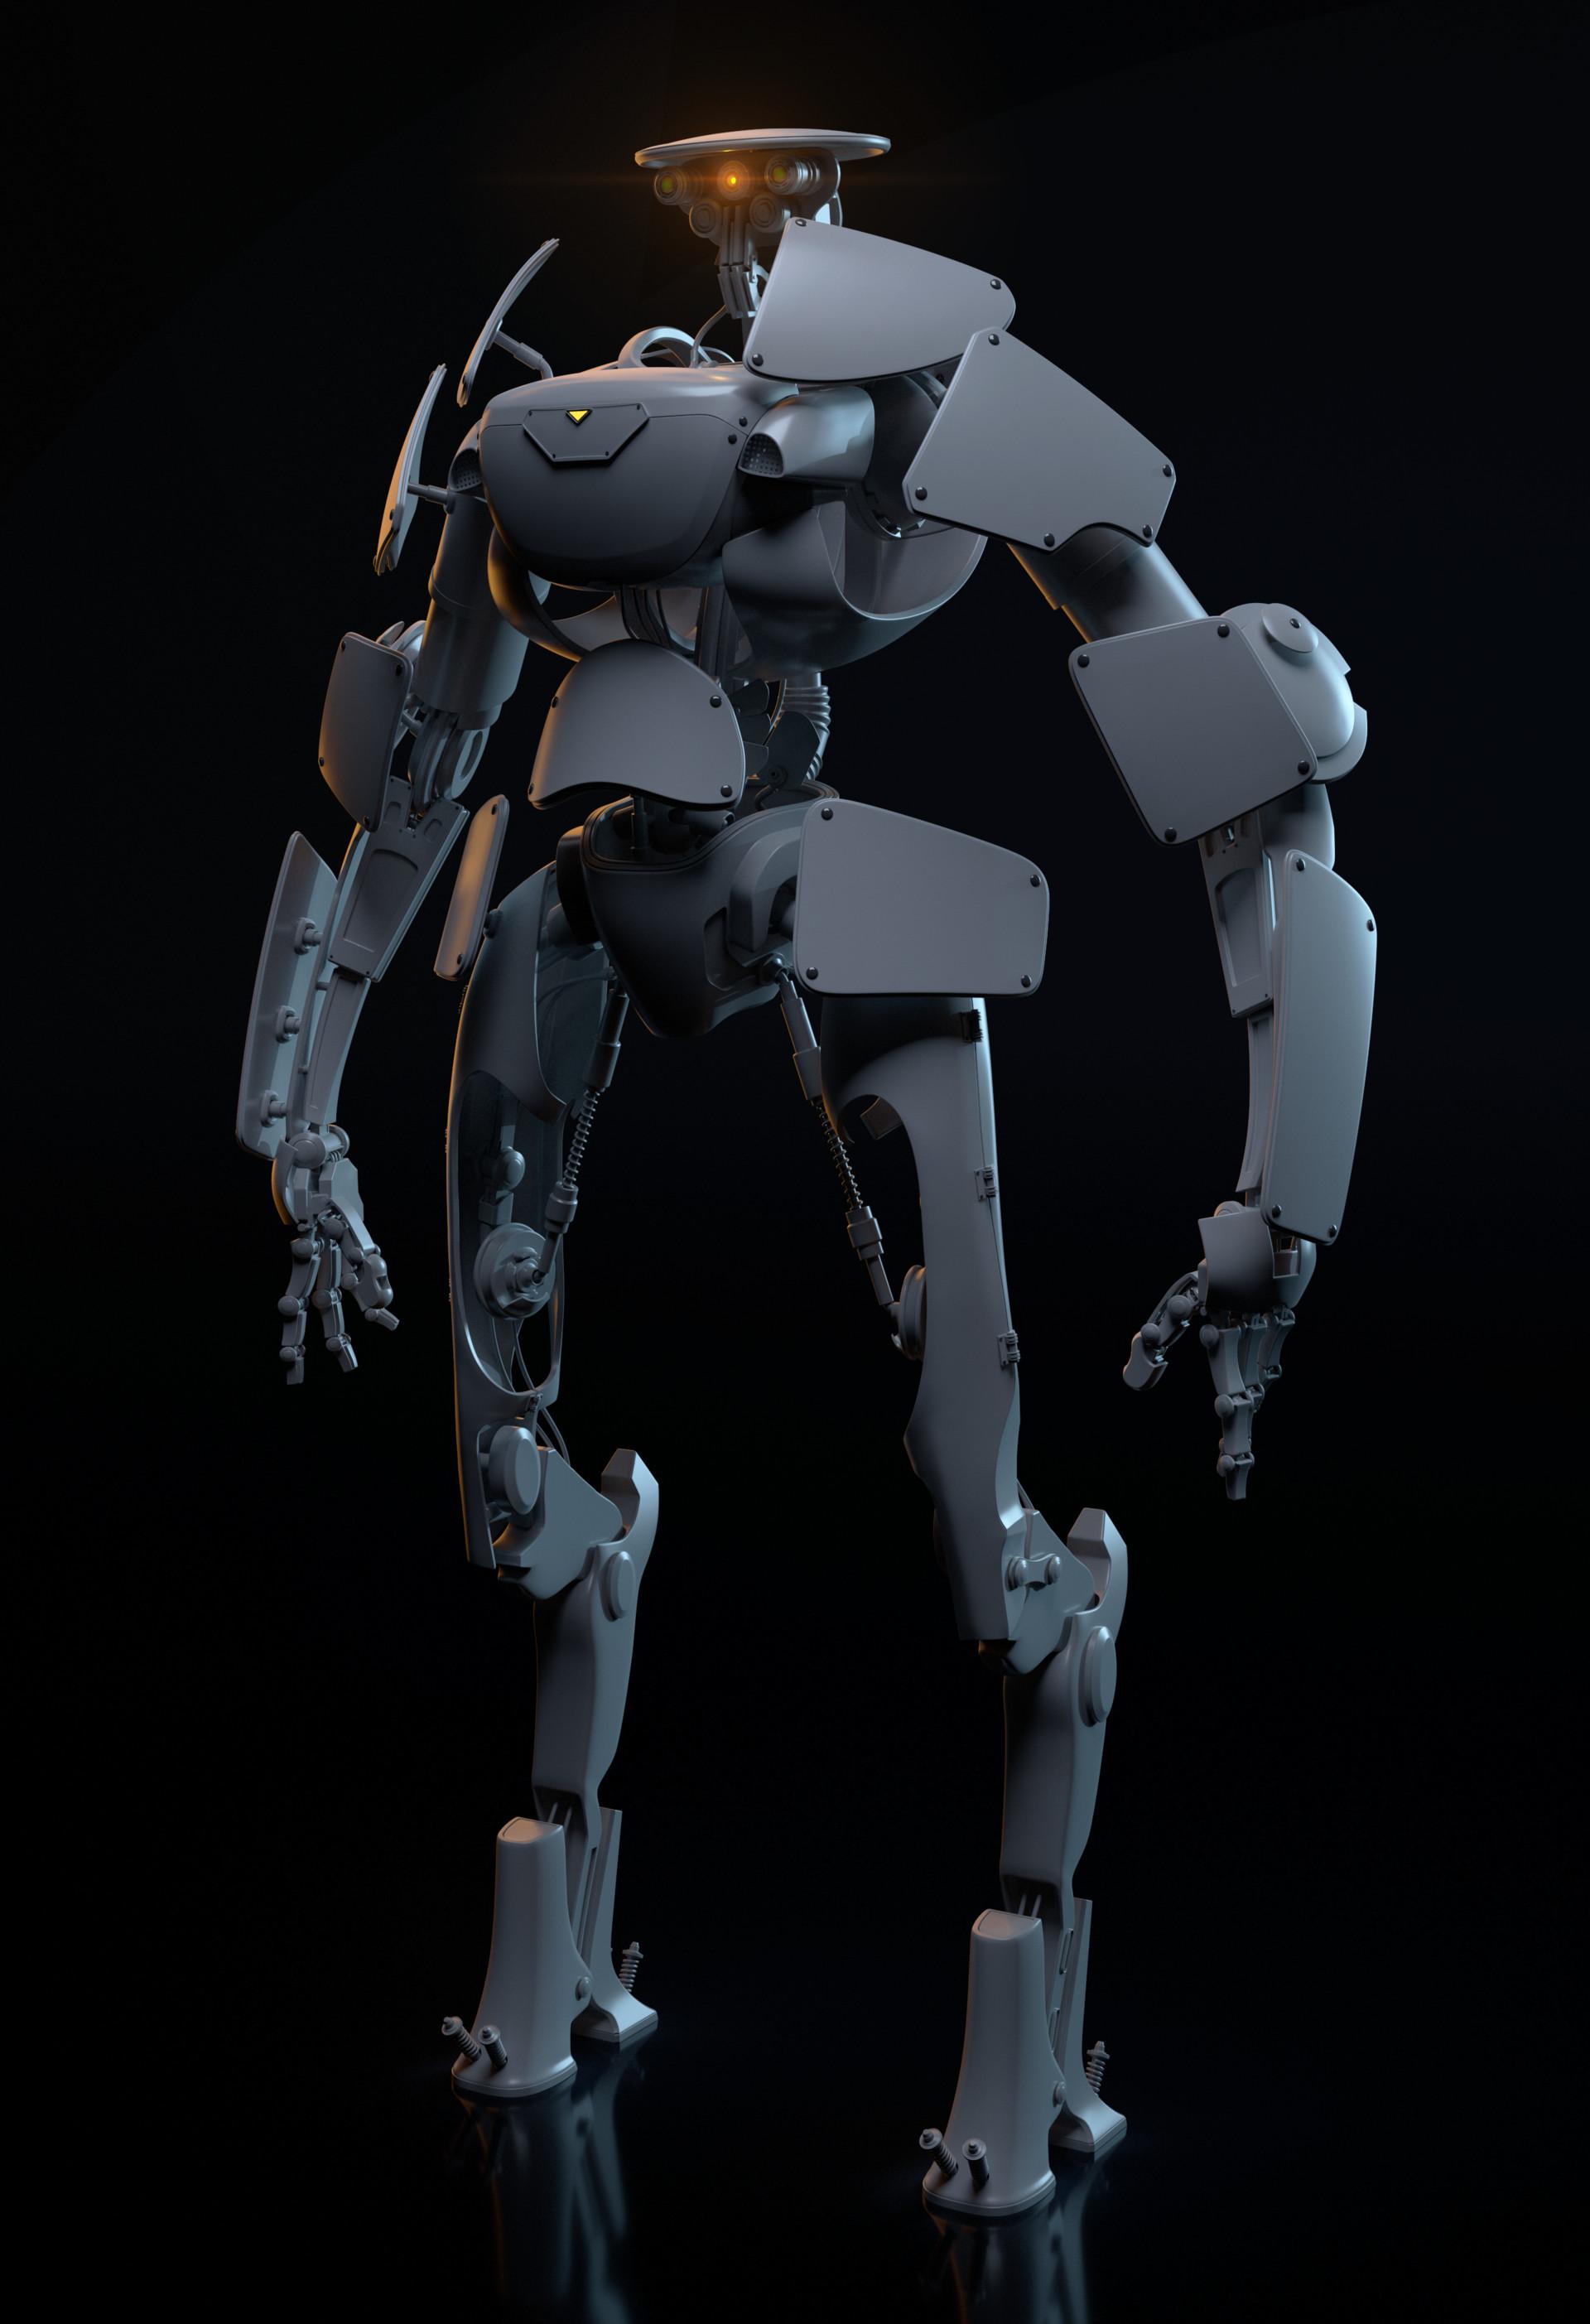 Alec hunstx alechunstx droid frontcomp